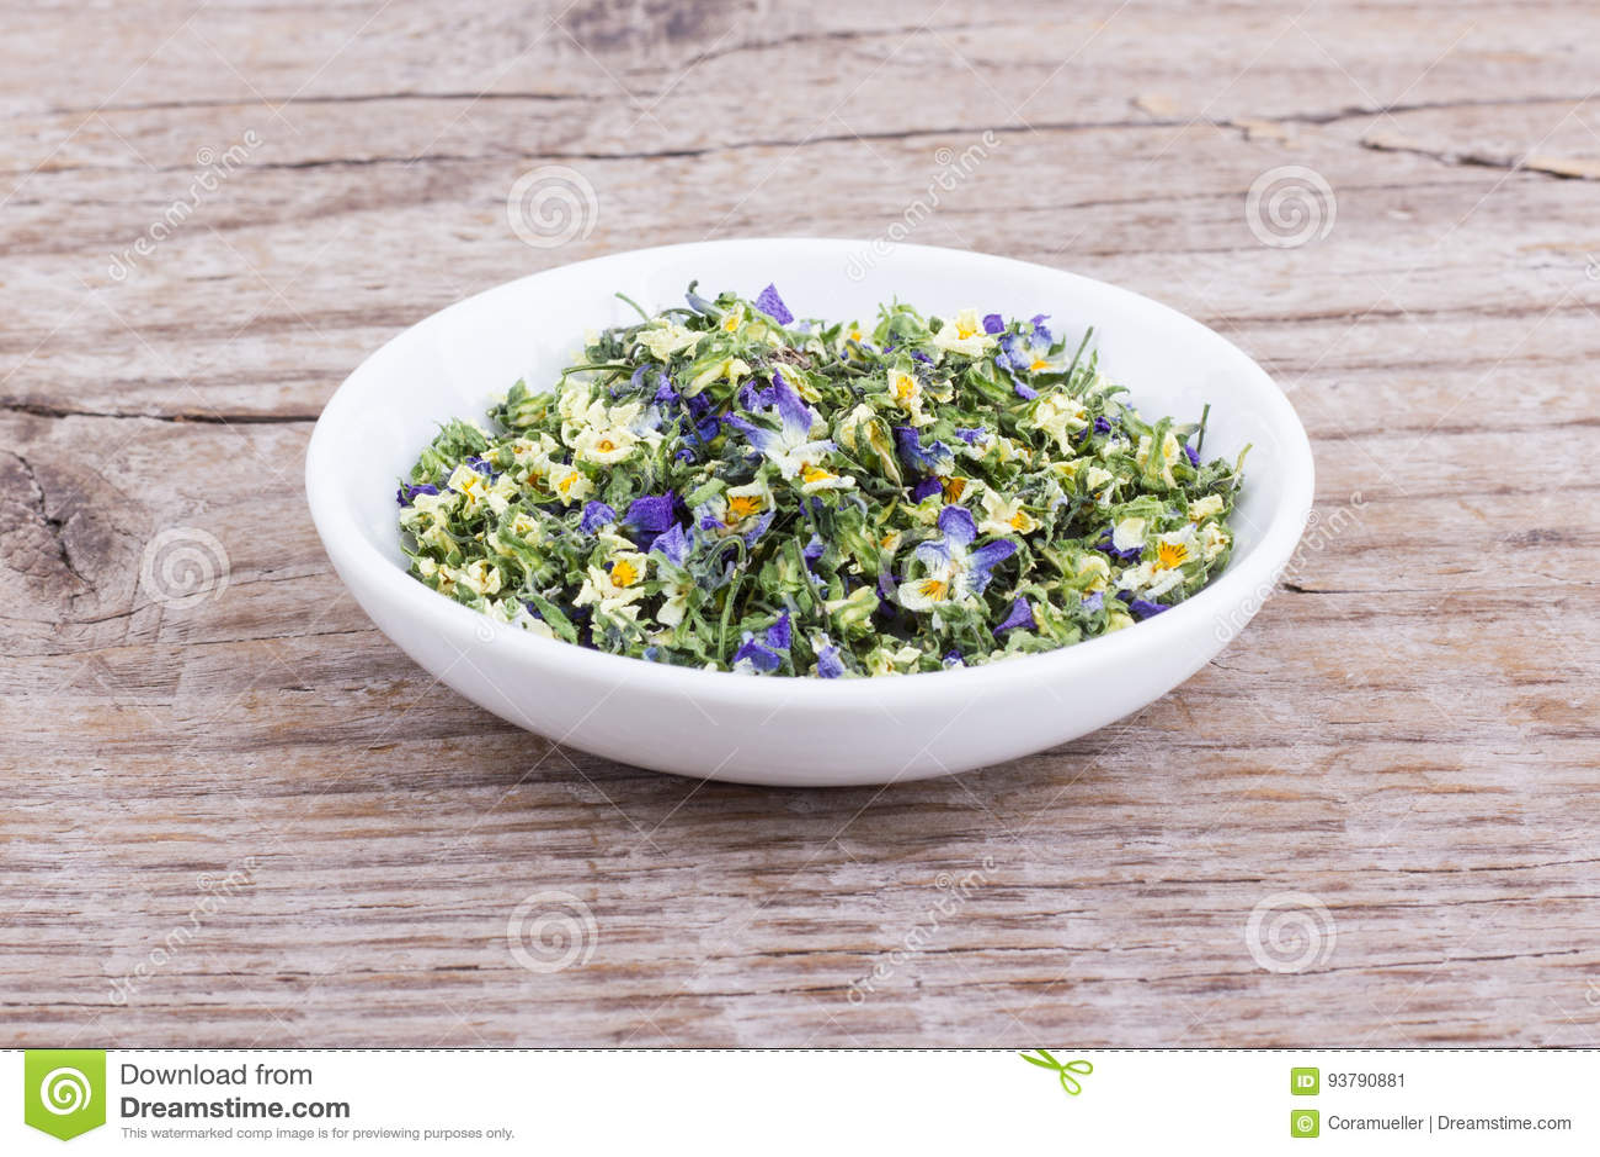 Small, violet heartsease